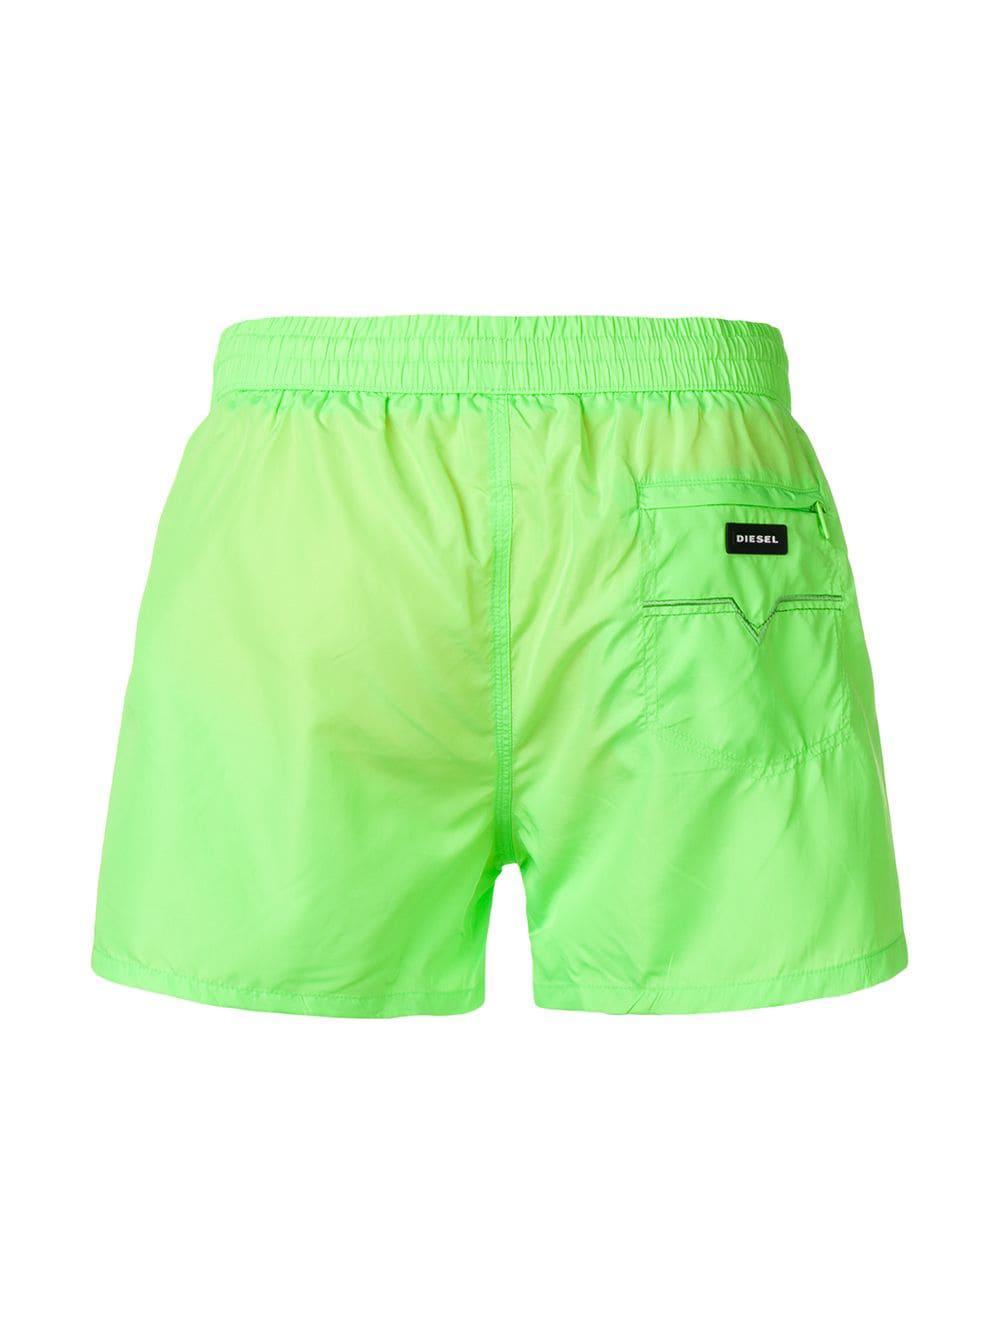 0a9095d682 DIESEL - Green Sandy Swim Shorts for Men - Lyst. View fullscreen